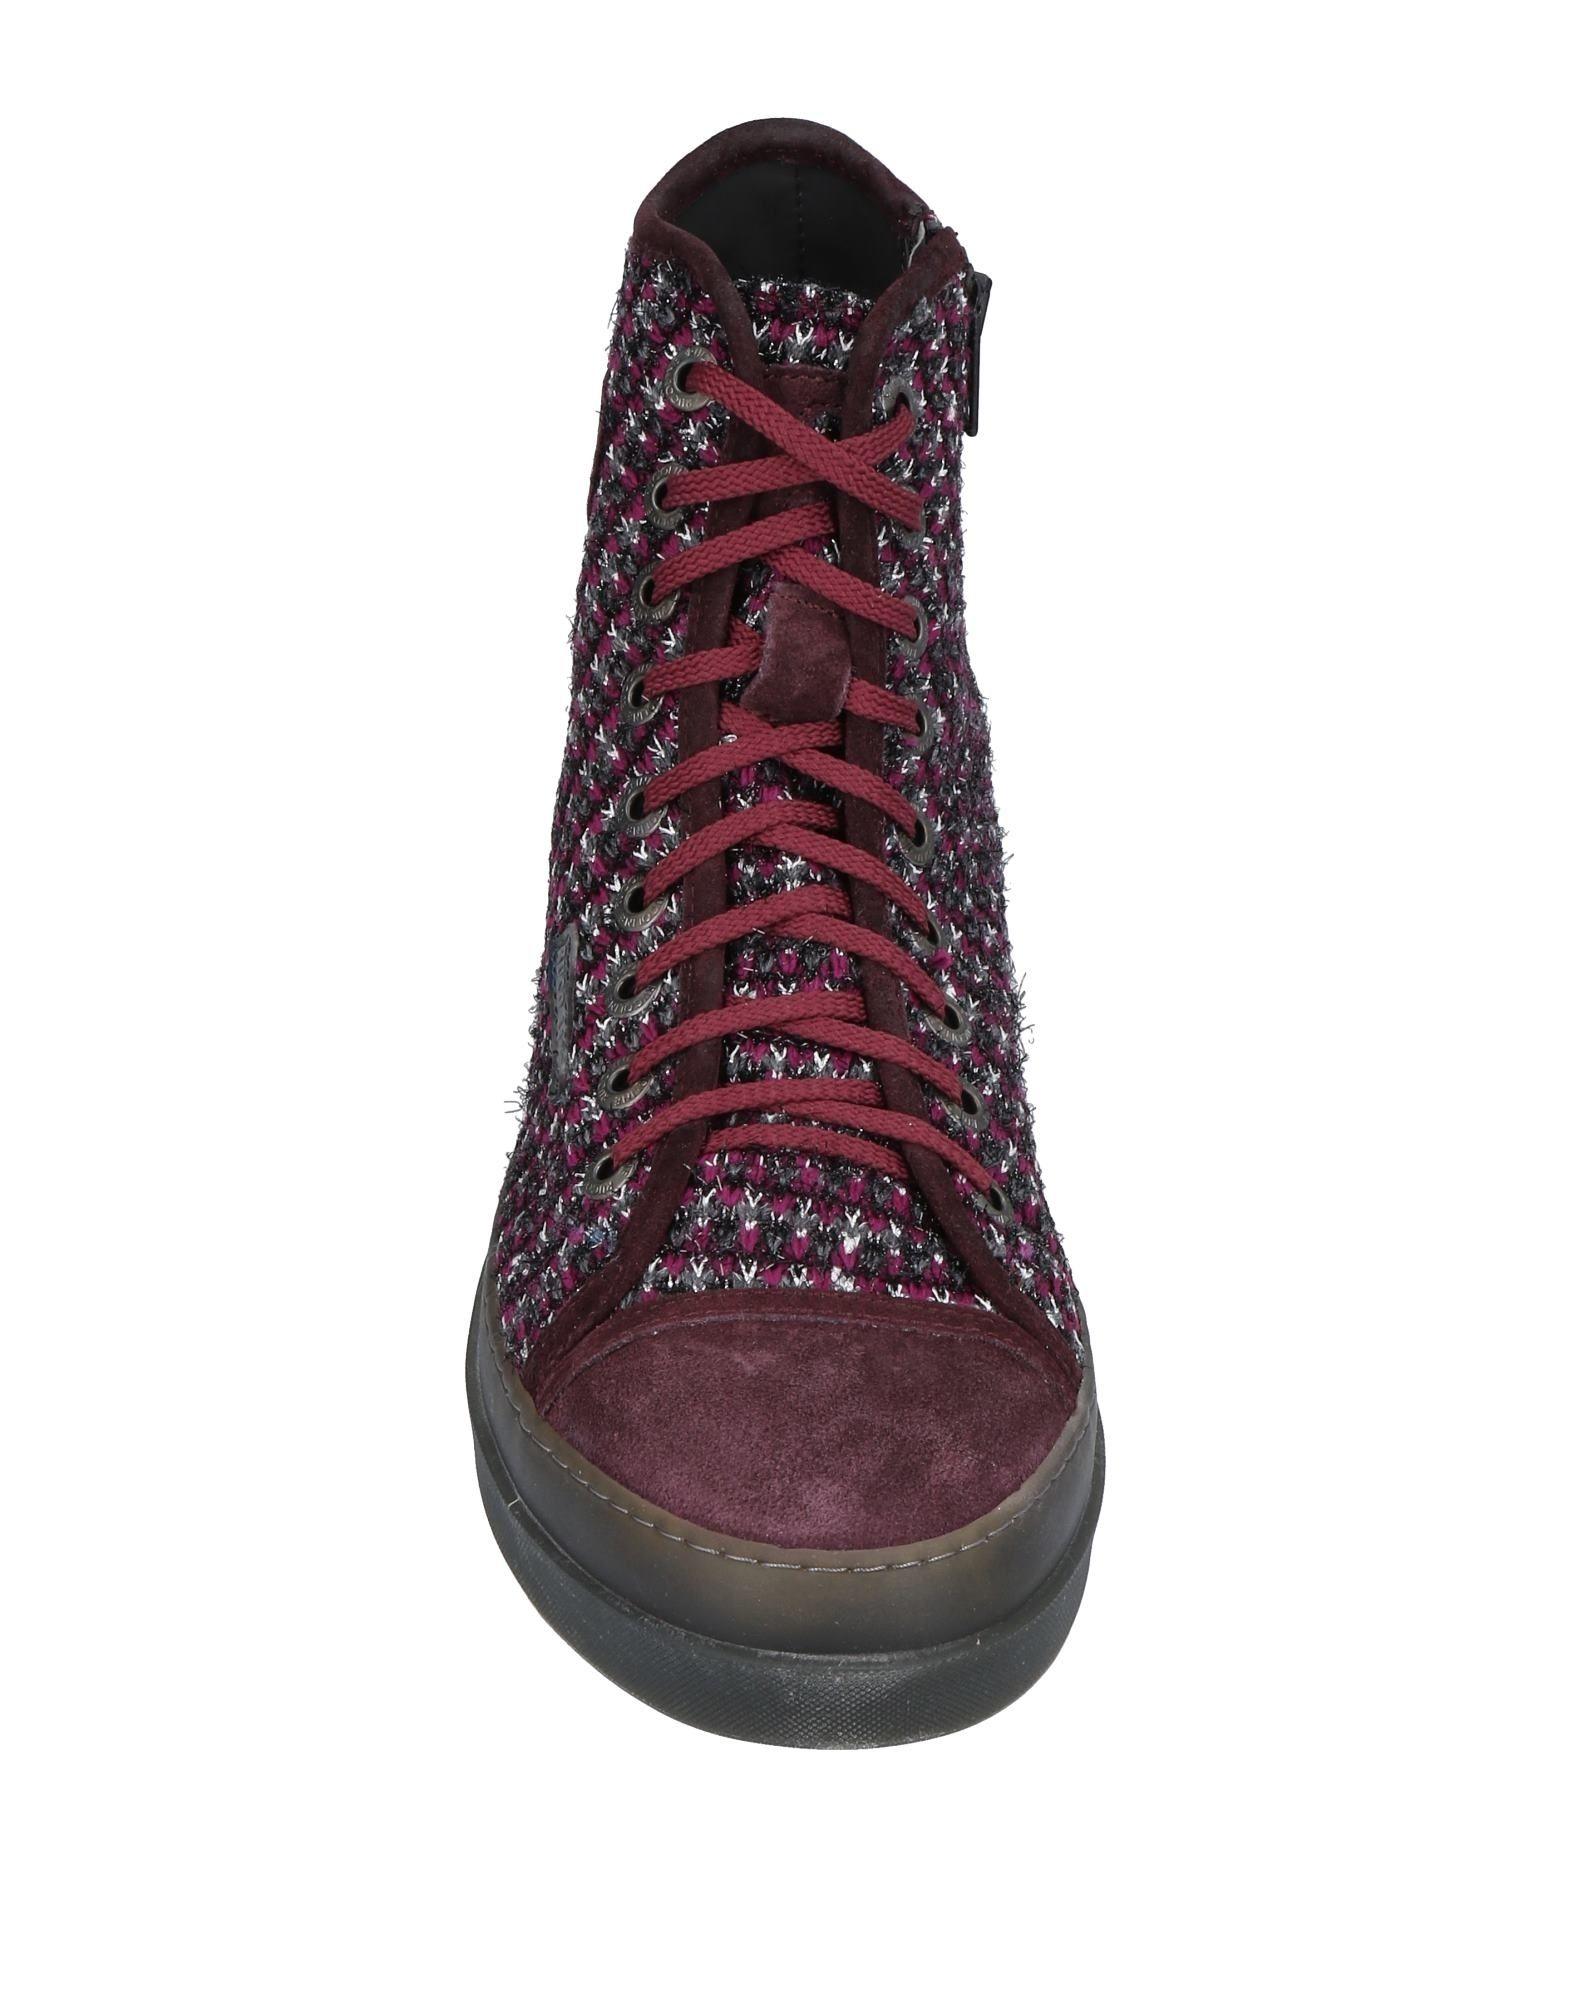 Ruco Sneakers Line Sneakers Ruco Damen Gutes Preis-Leistungs-Verhältnis, es lohnt sich 16a49f